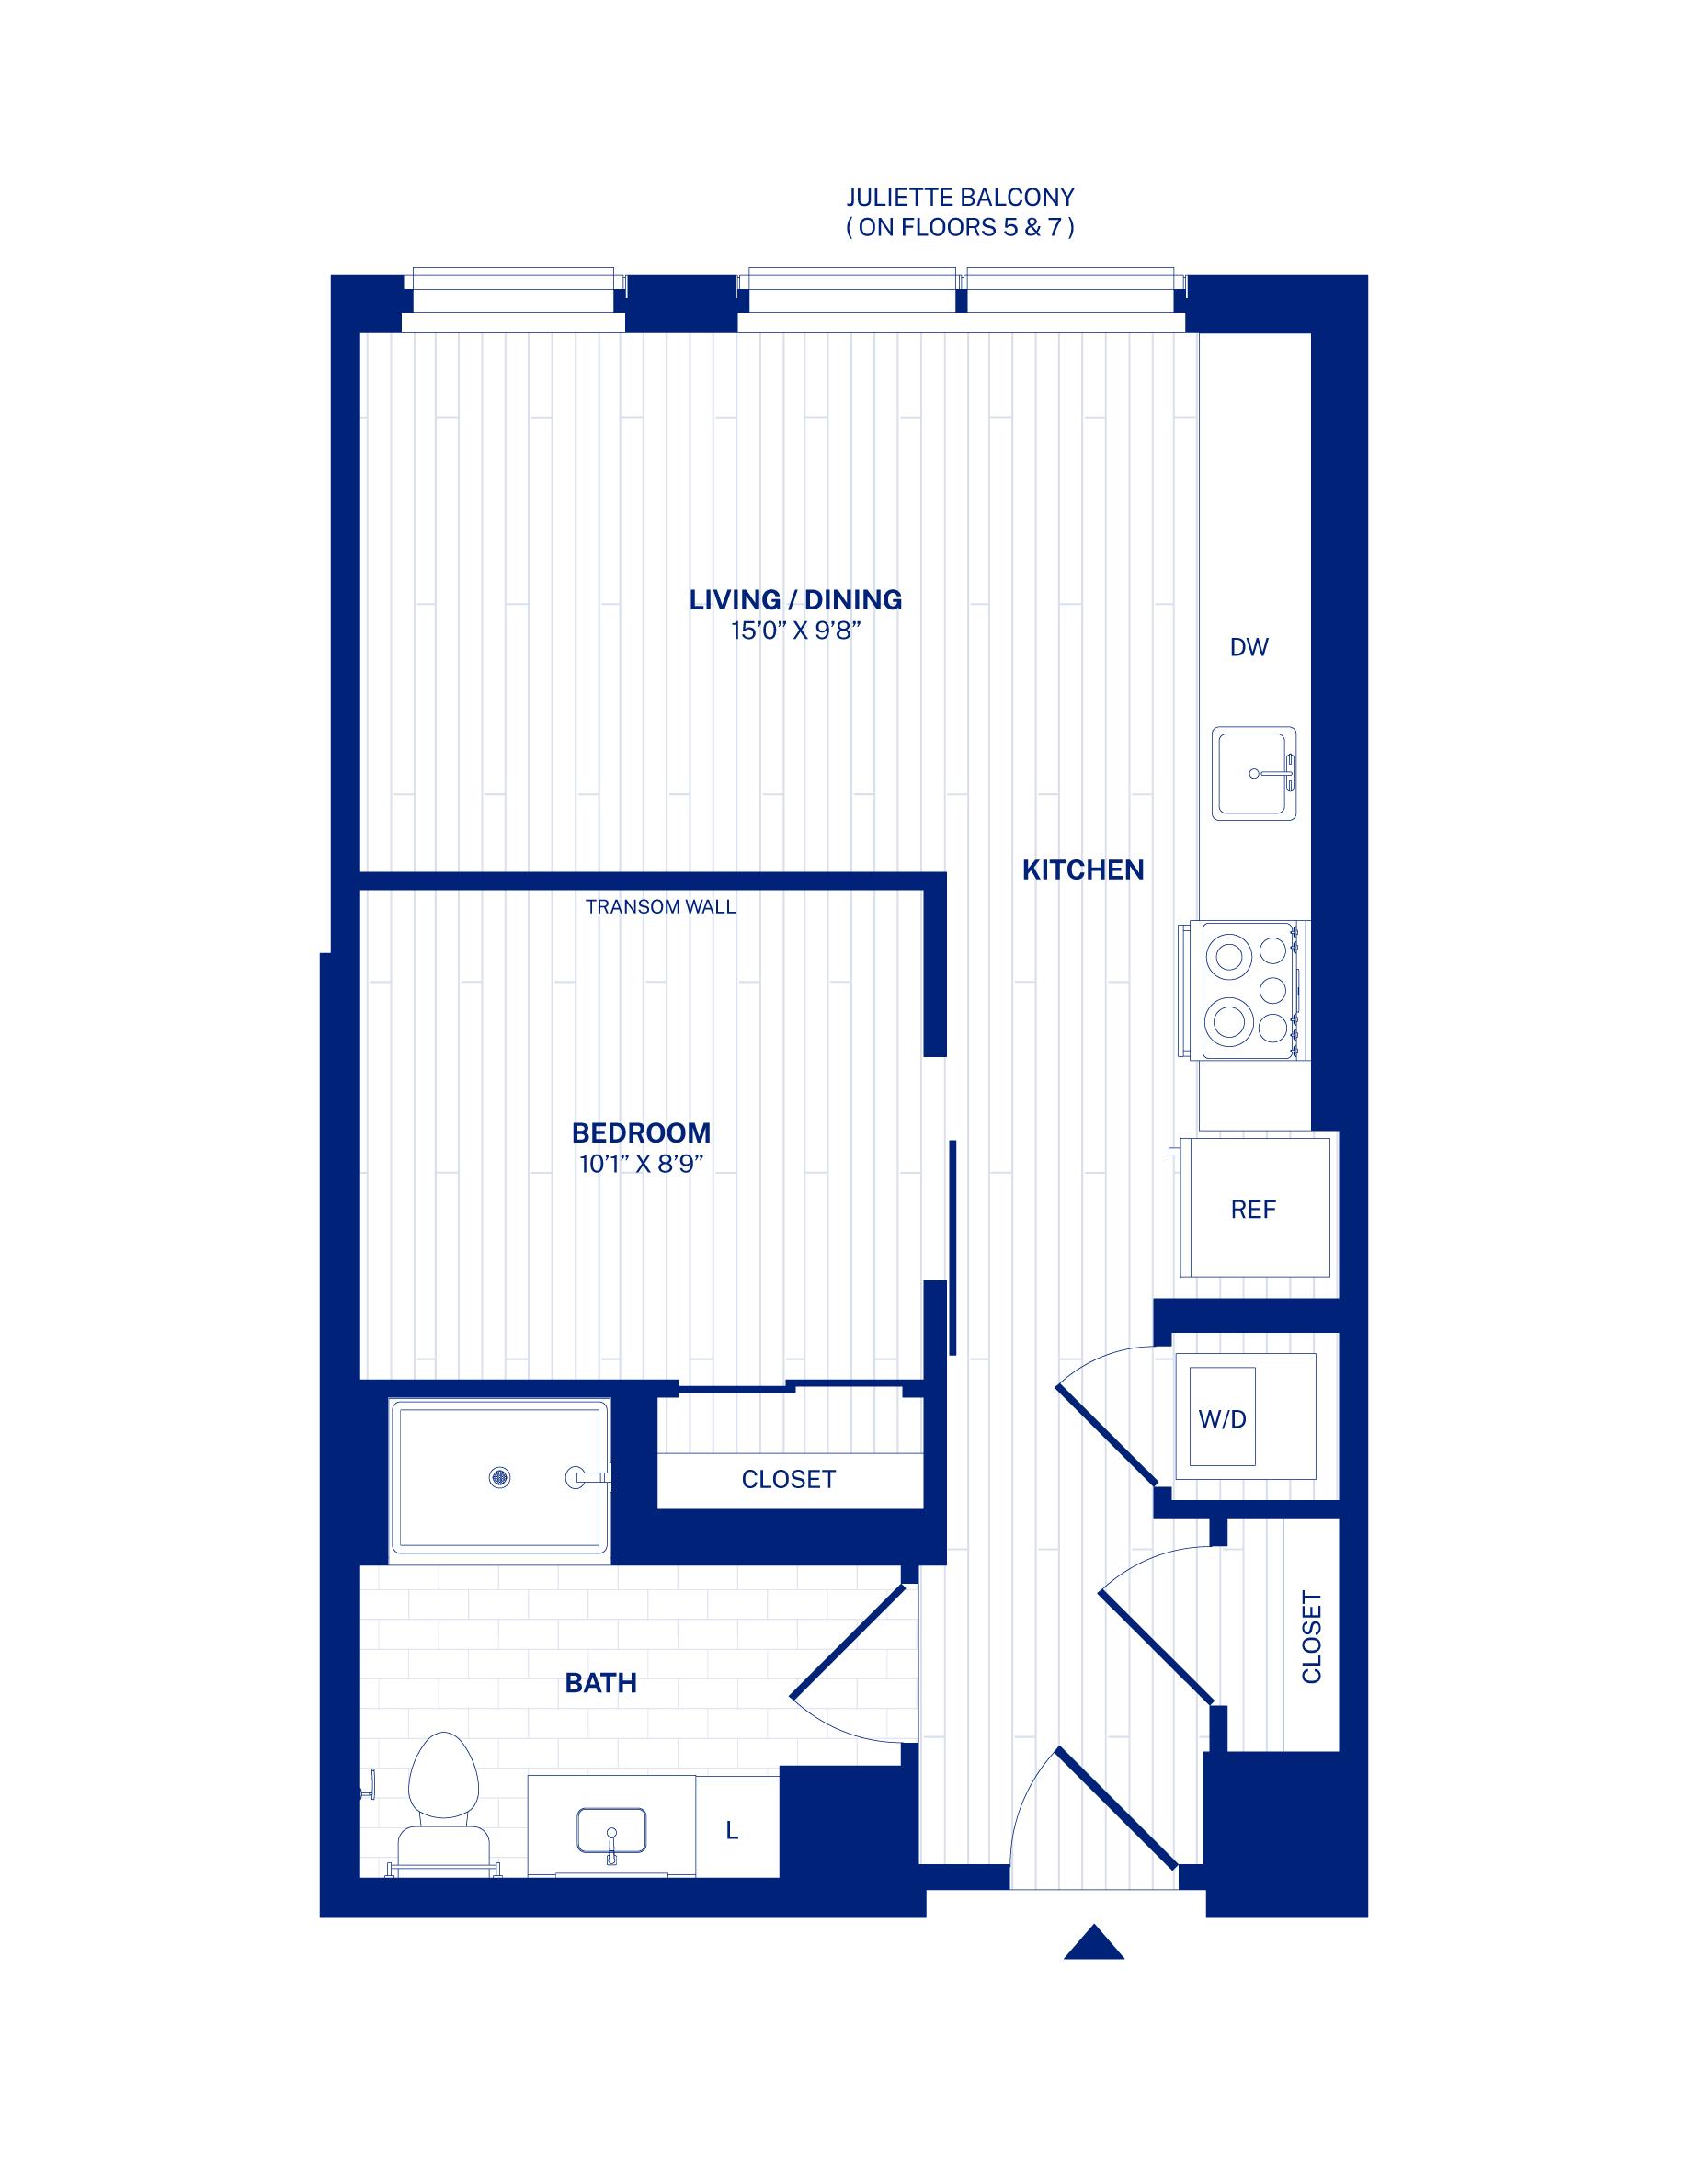 Residence 315 thumb